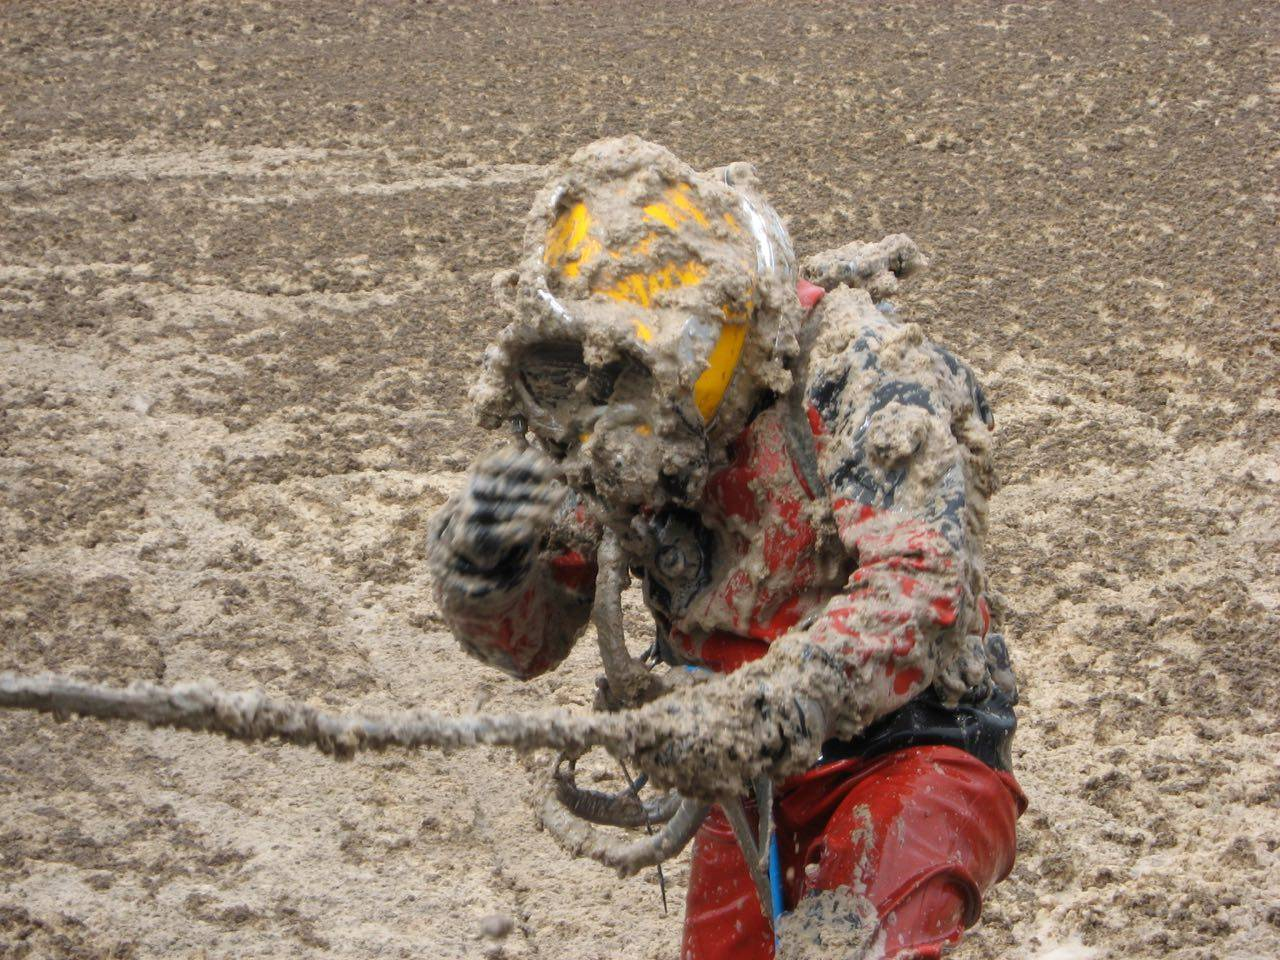 Contamination Diver